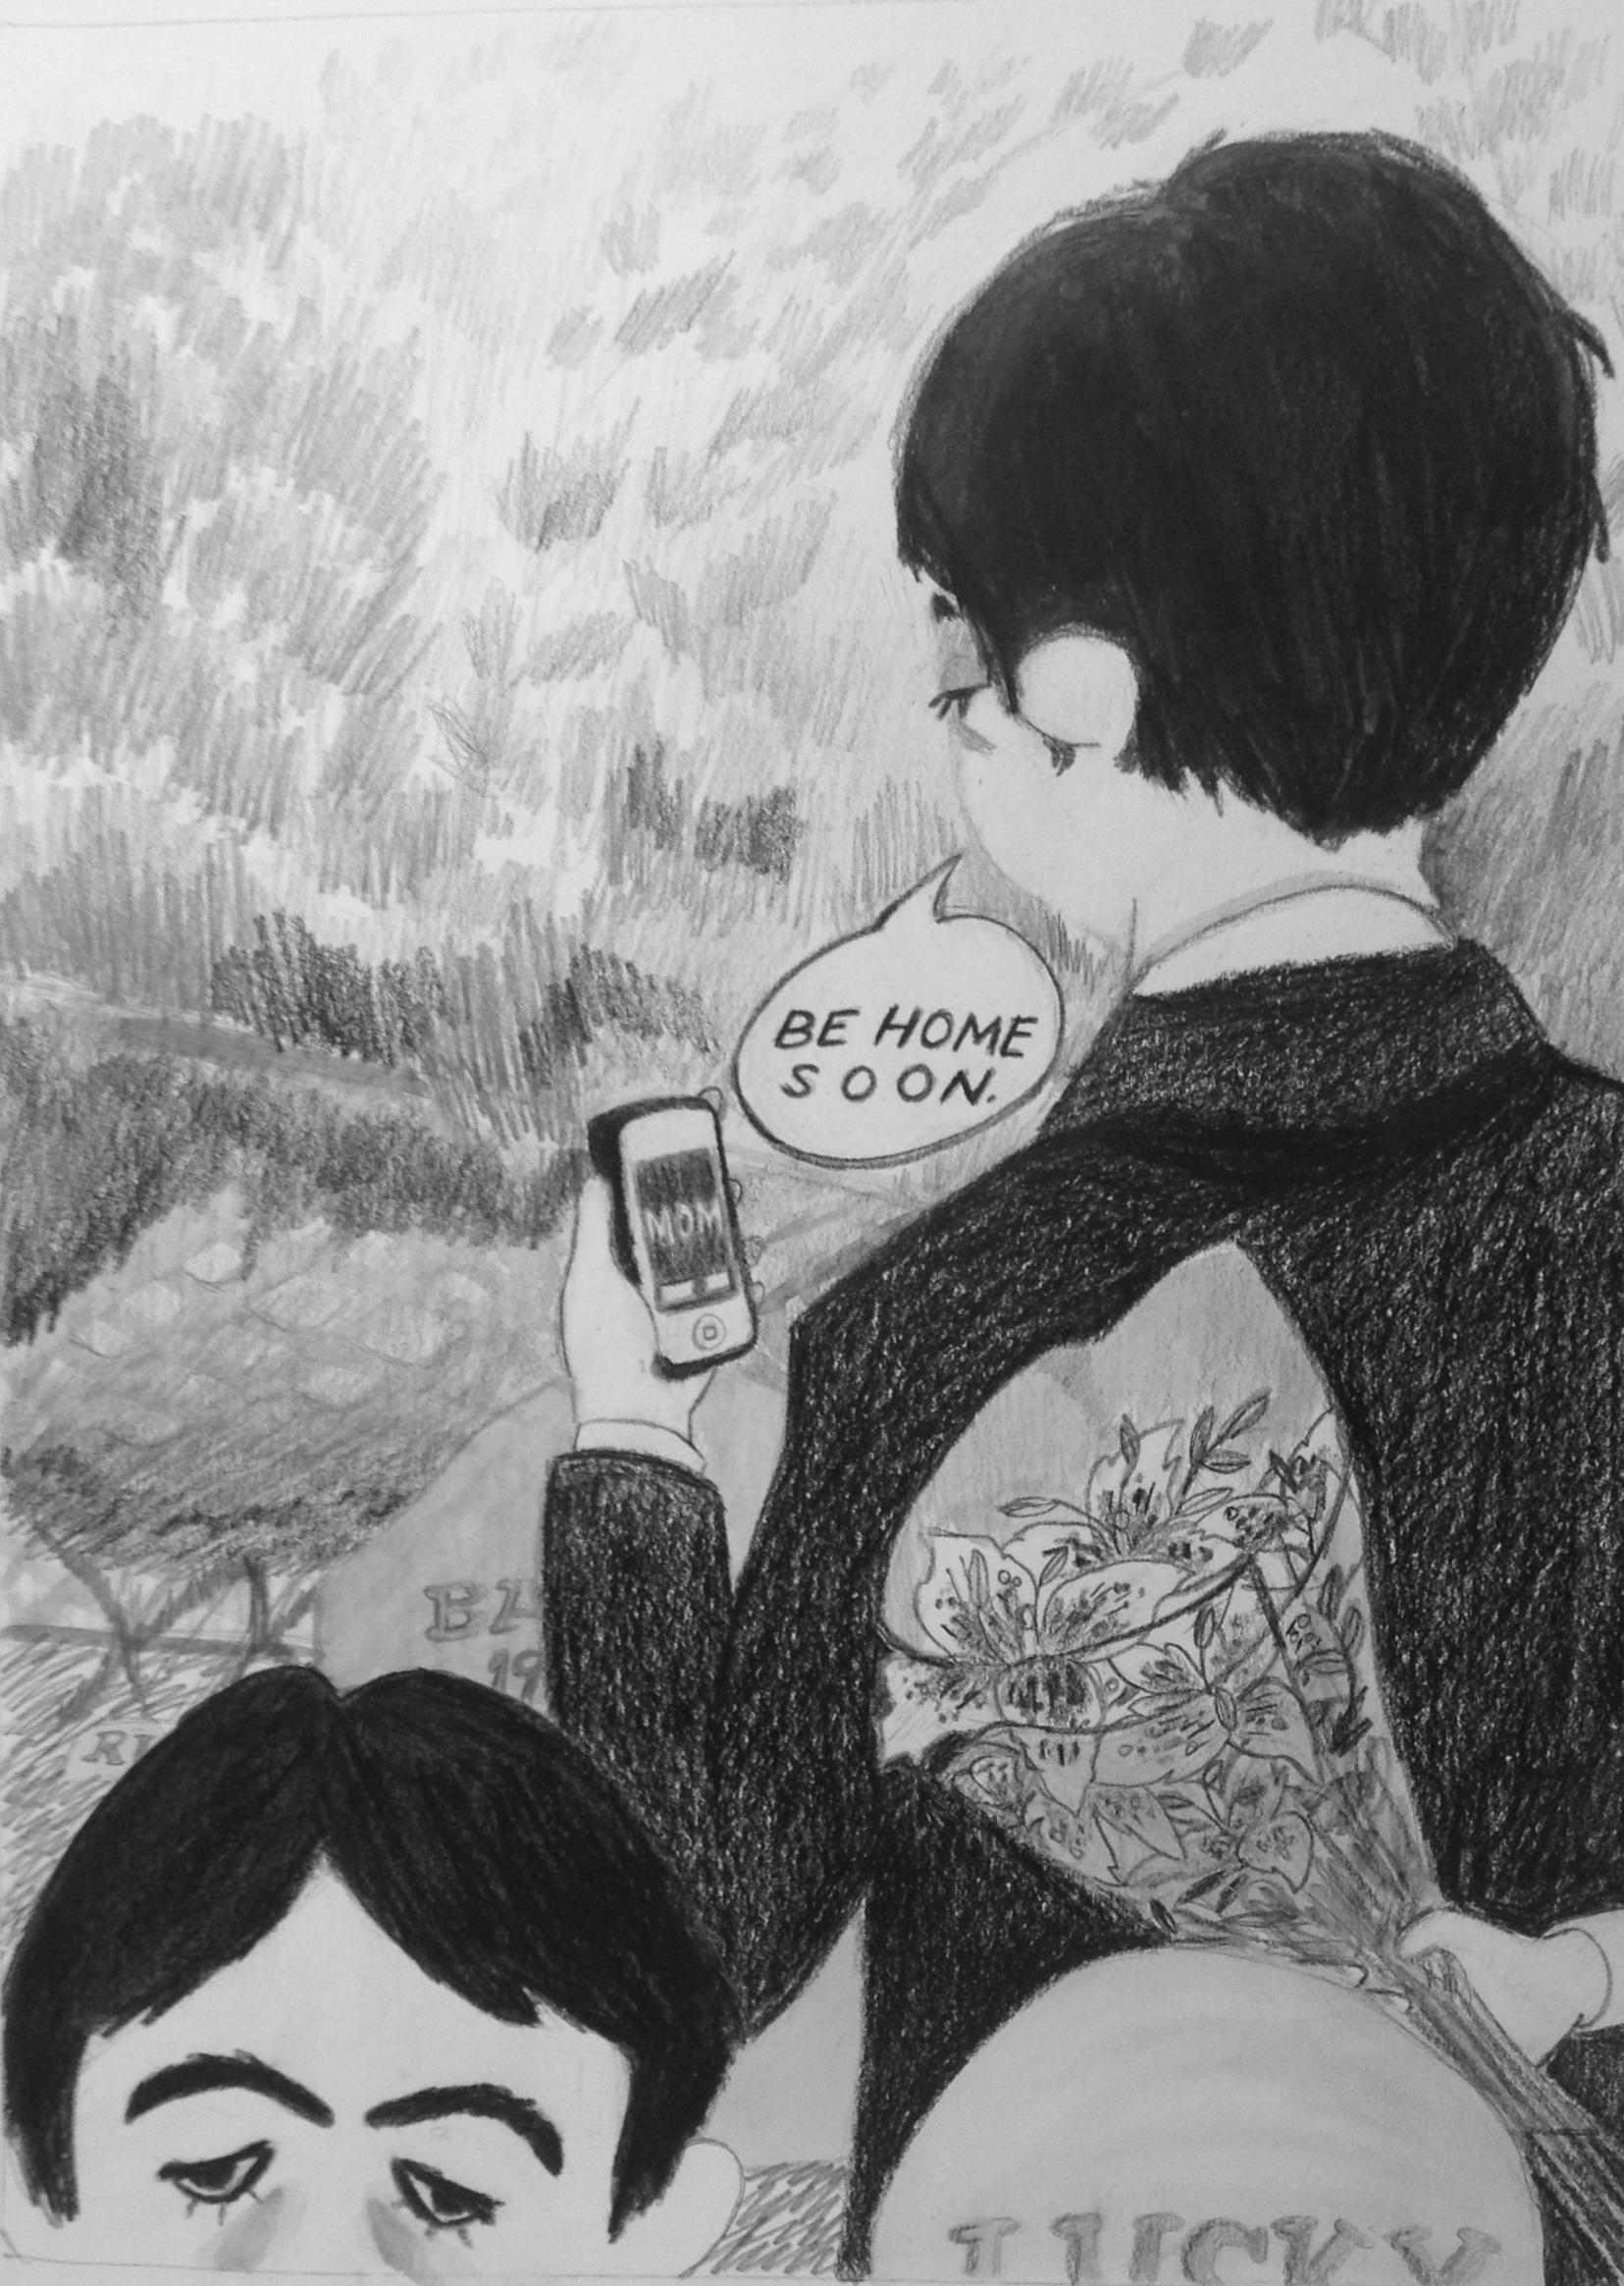 Illustrations by Mariela Napolitano